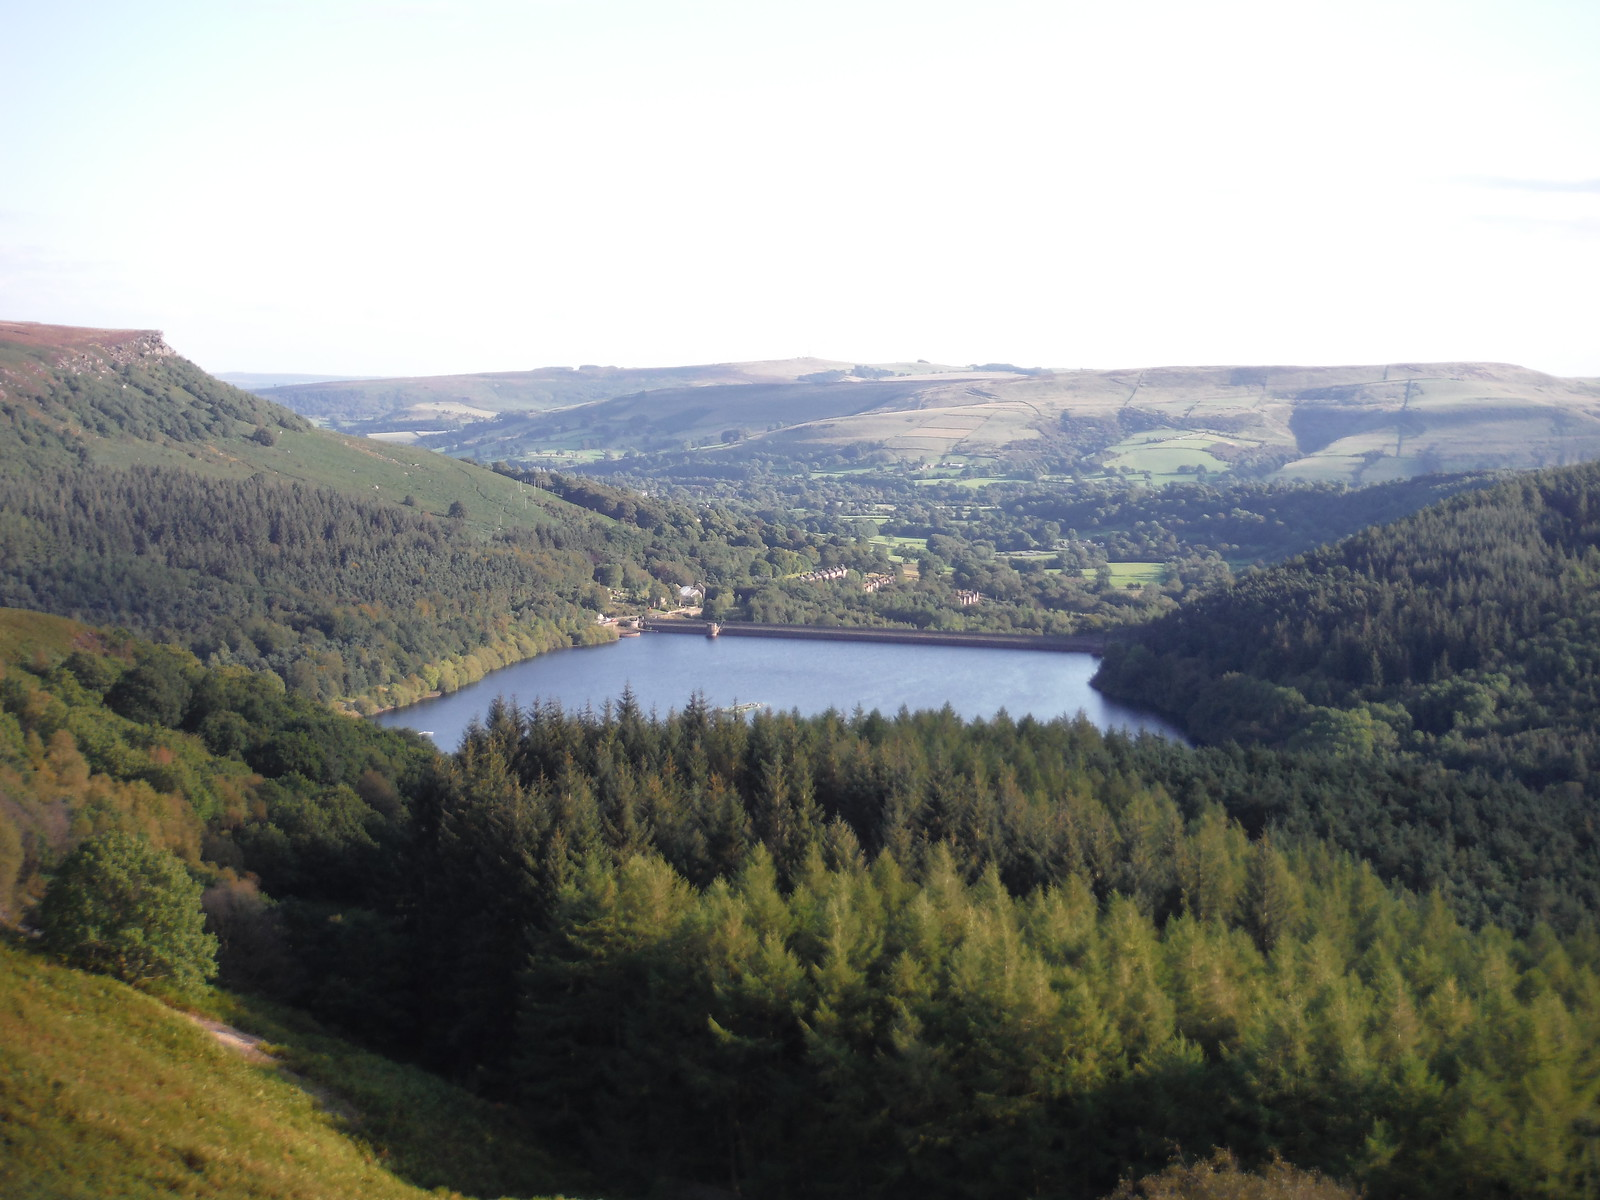 Ladybower Dam, Yorkshire Bridge, Hope Valley, Shatton Edge/Offerton Moor SWC Walk 348 - Ladybower Inn Circular (via Derwent Edges and Strines)